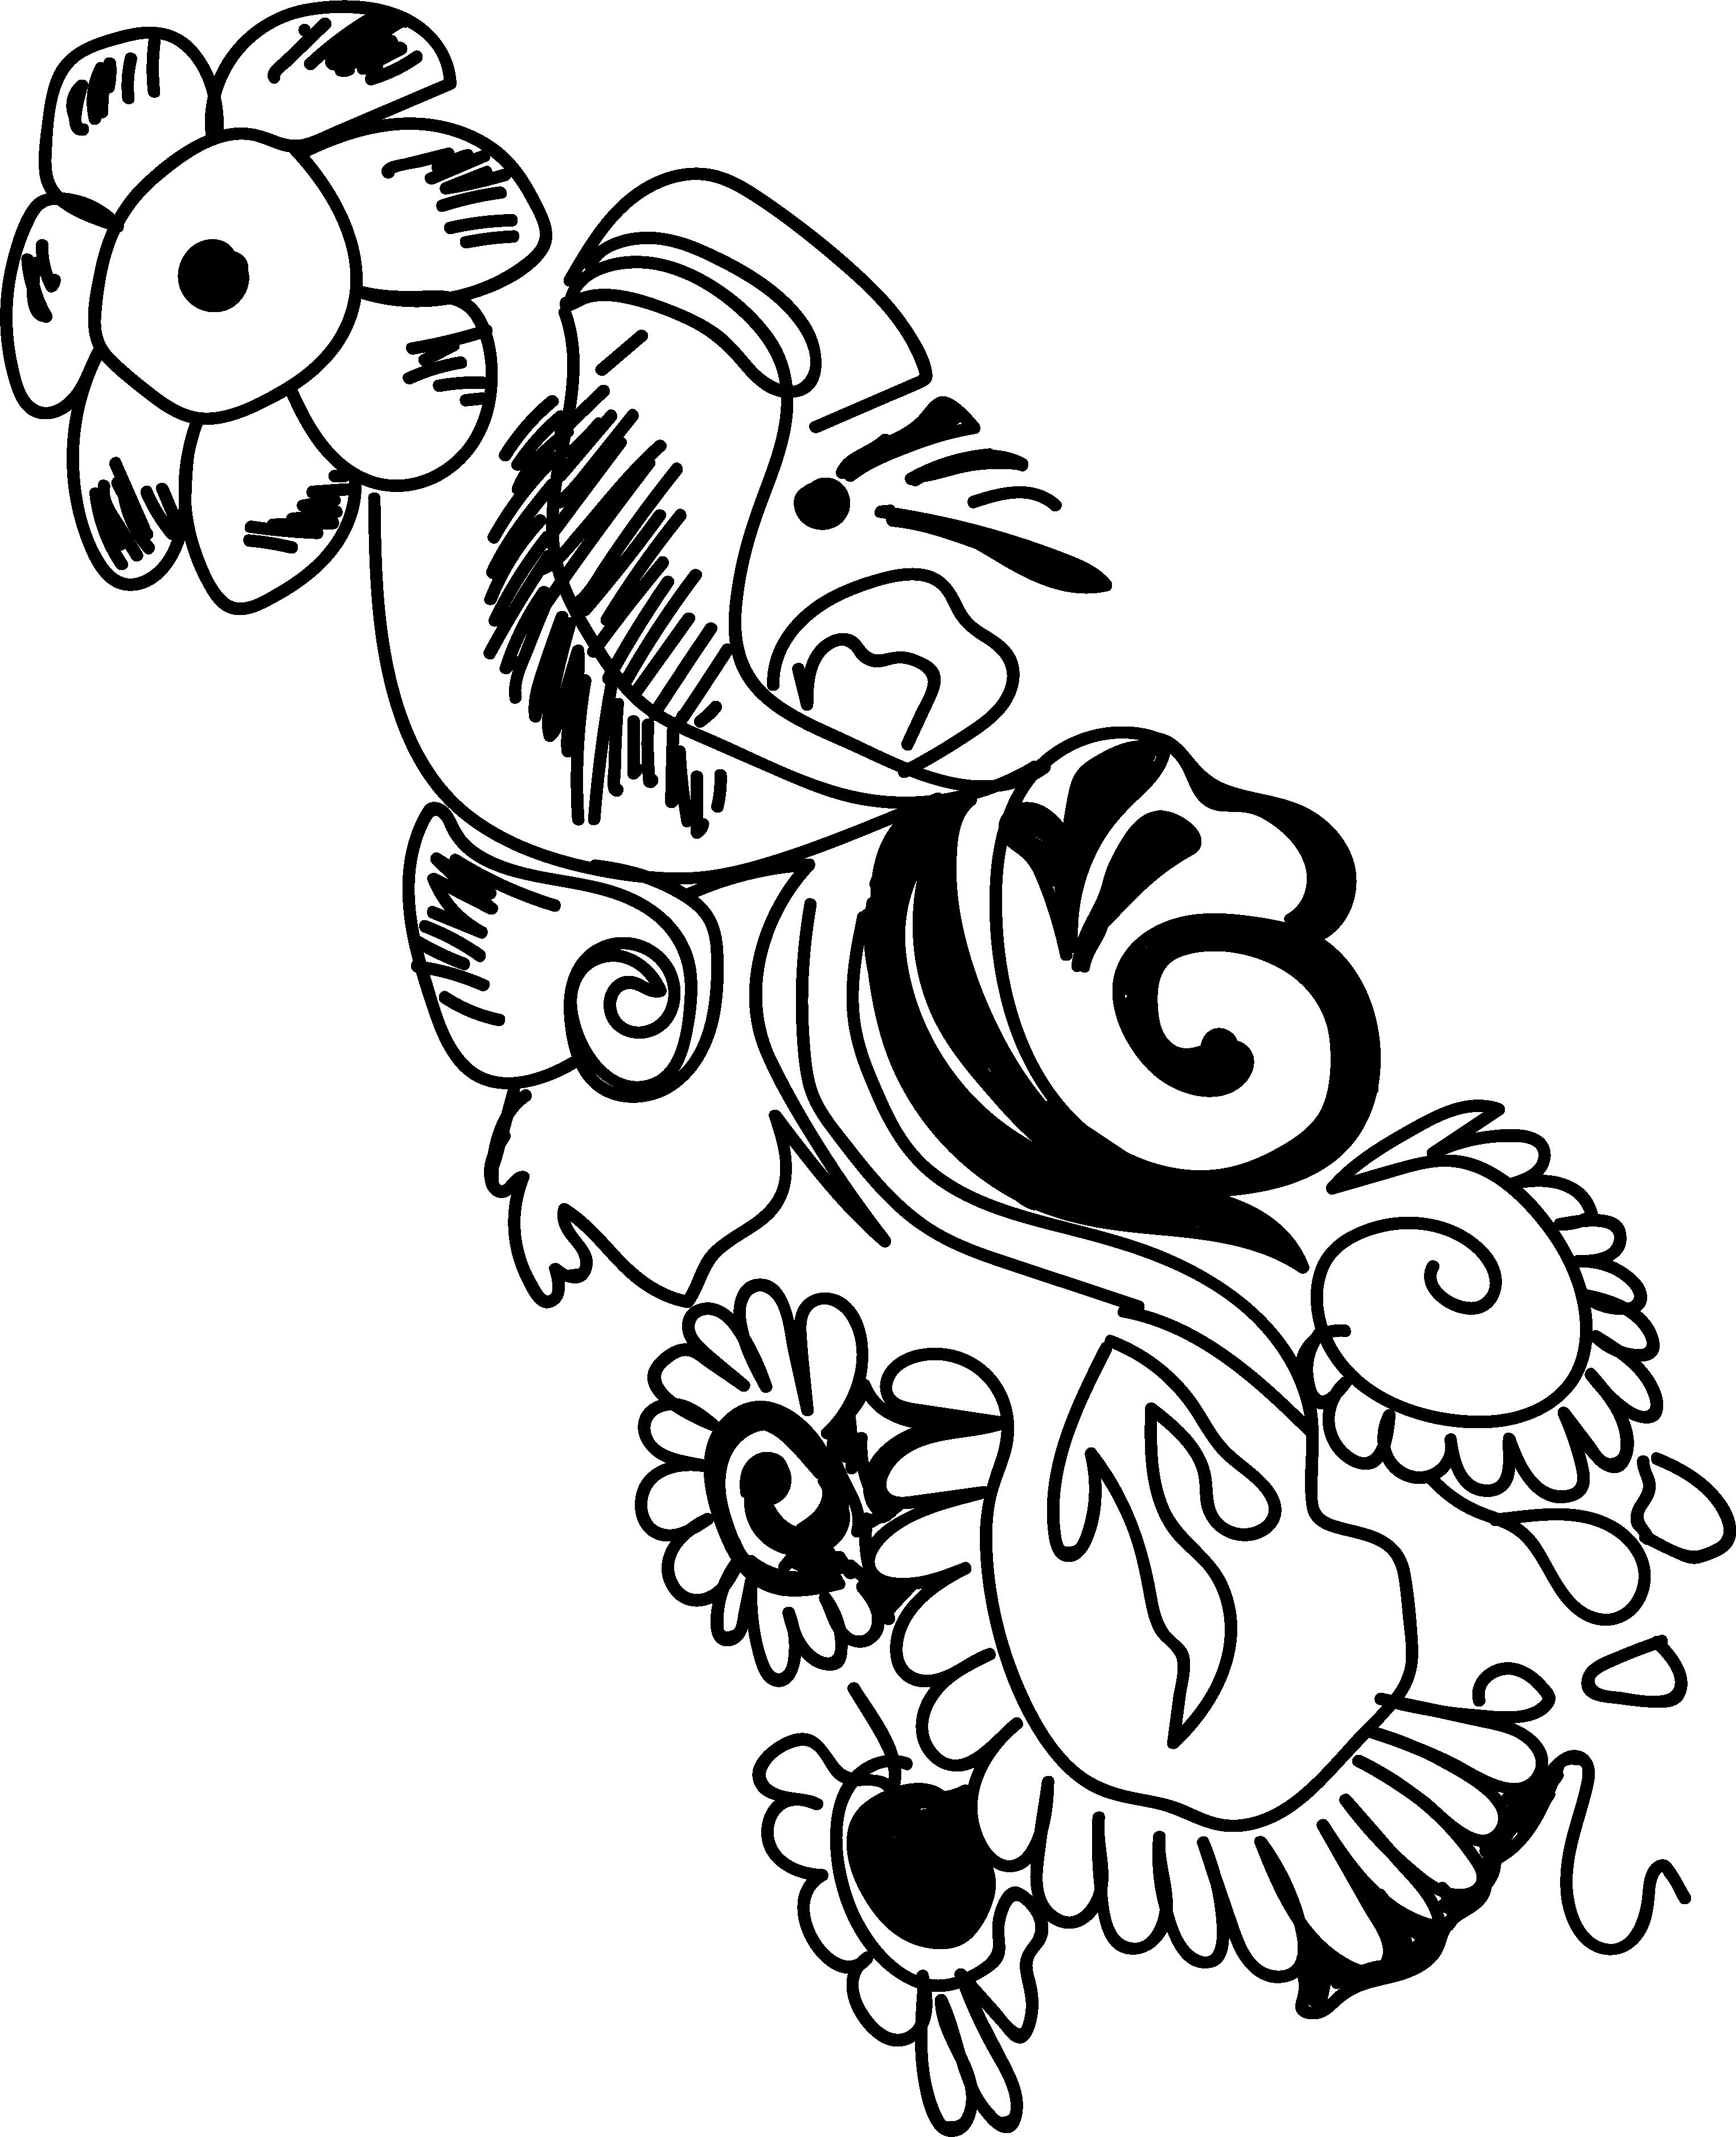 oihane amurrio